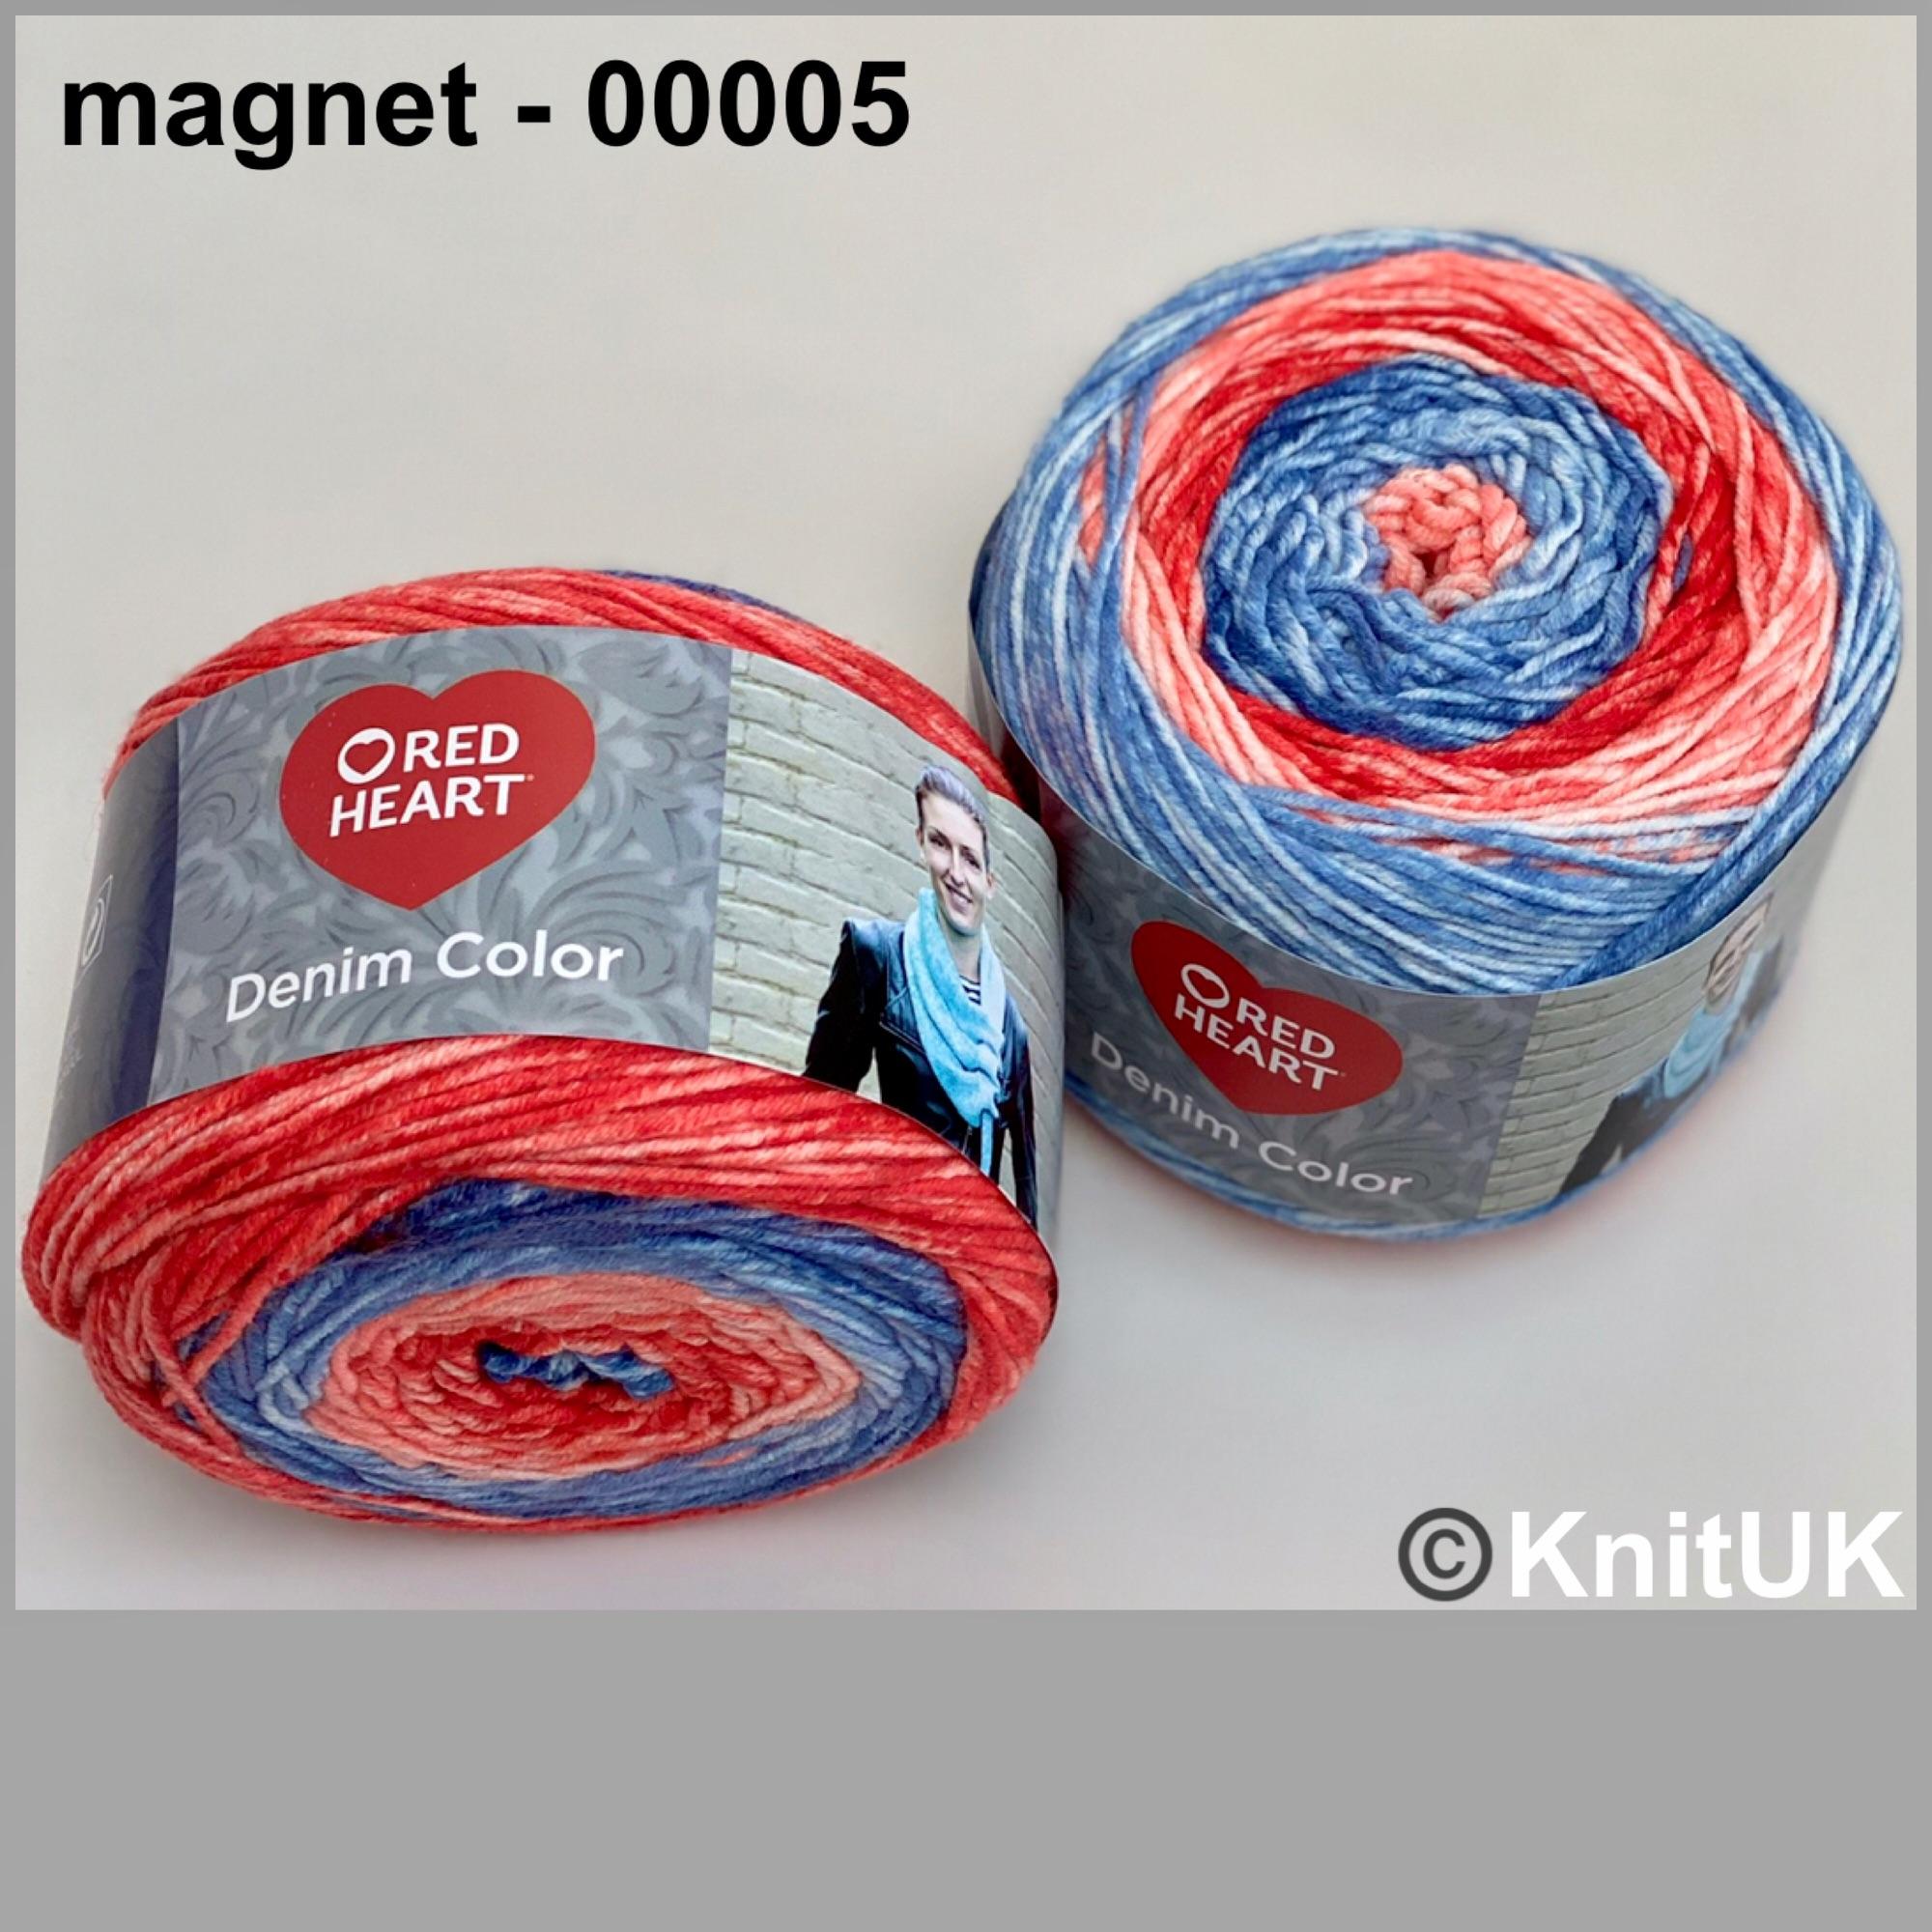 Red heart denim color magnet colour acrylic yarn loom knitting crochet